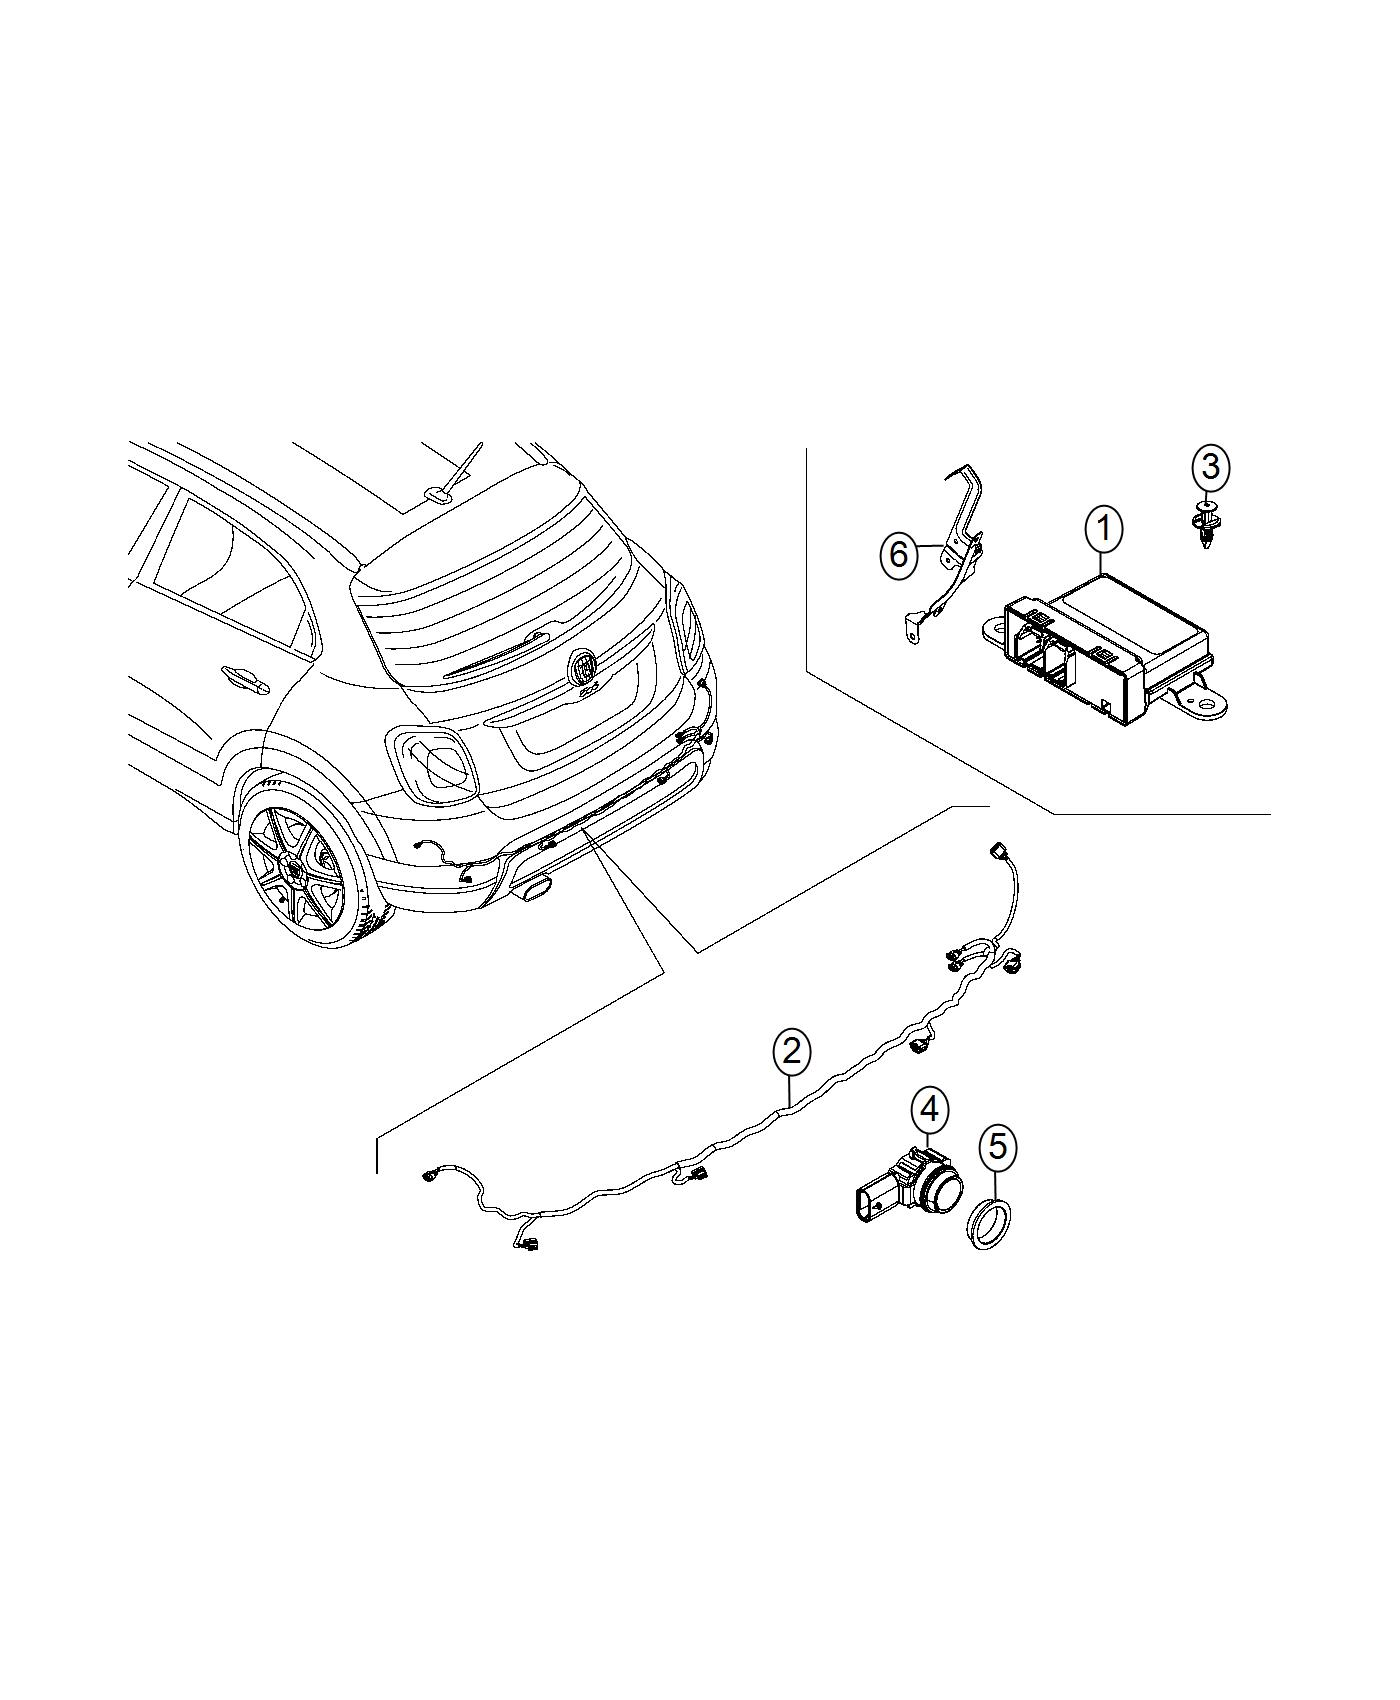 Dodge Ram 2500 Sensor. Park assist. Export, inner, mexico